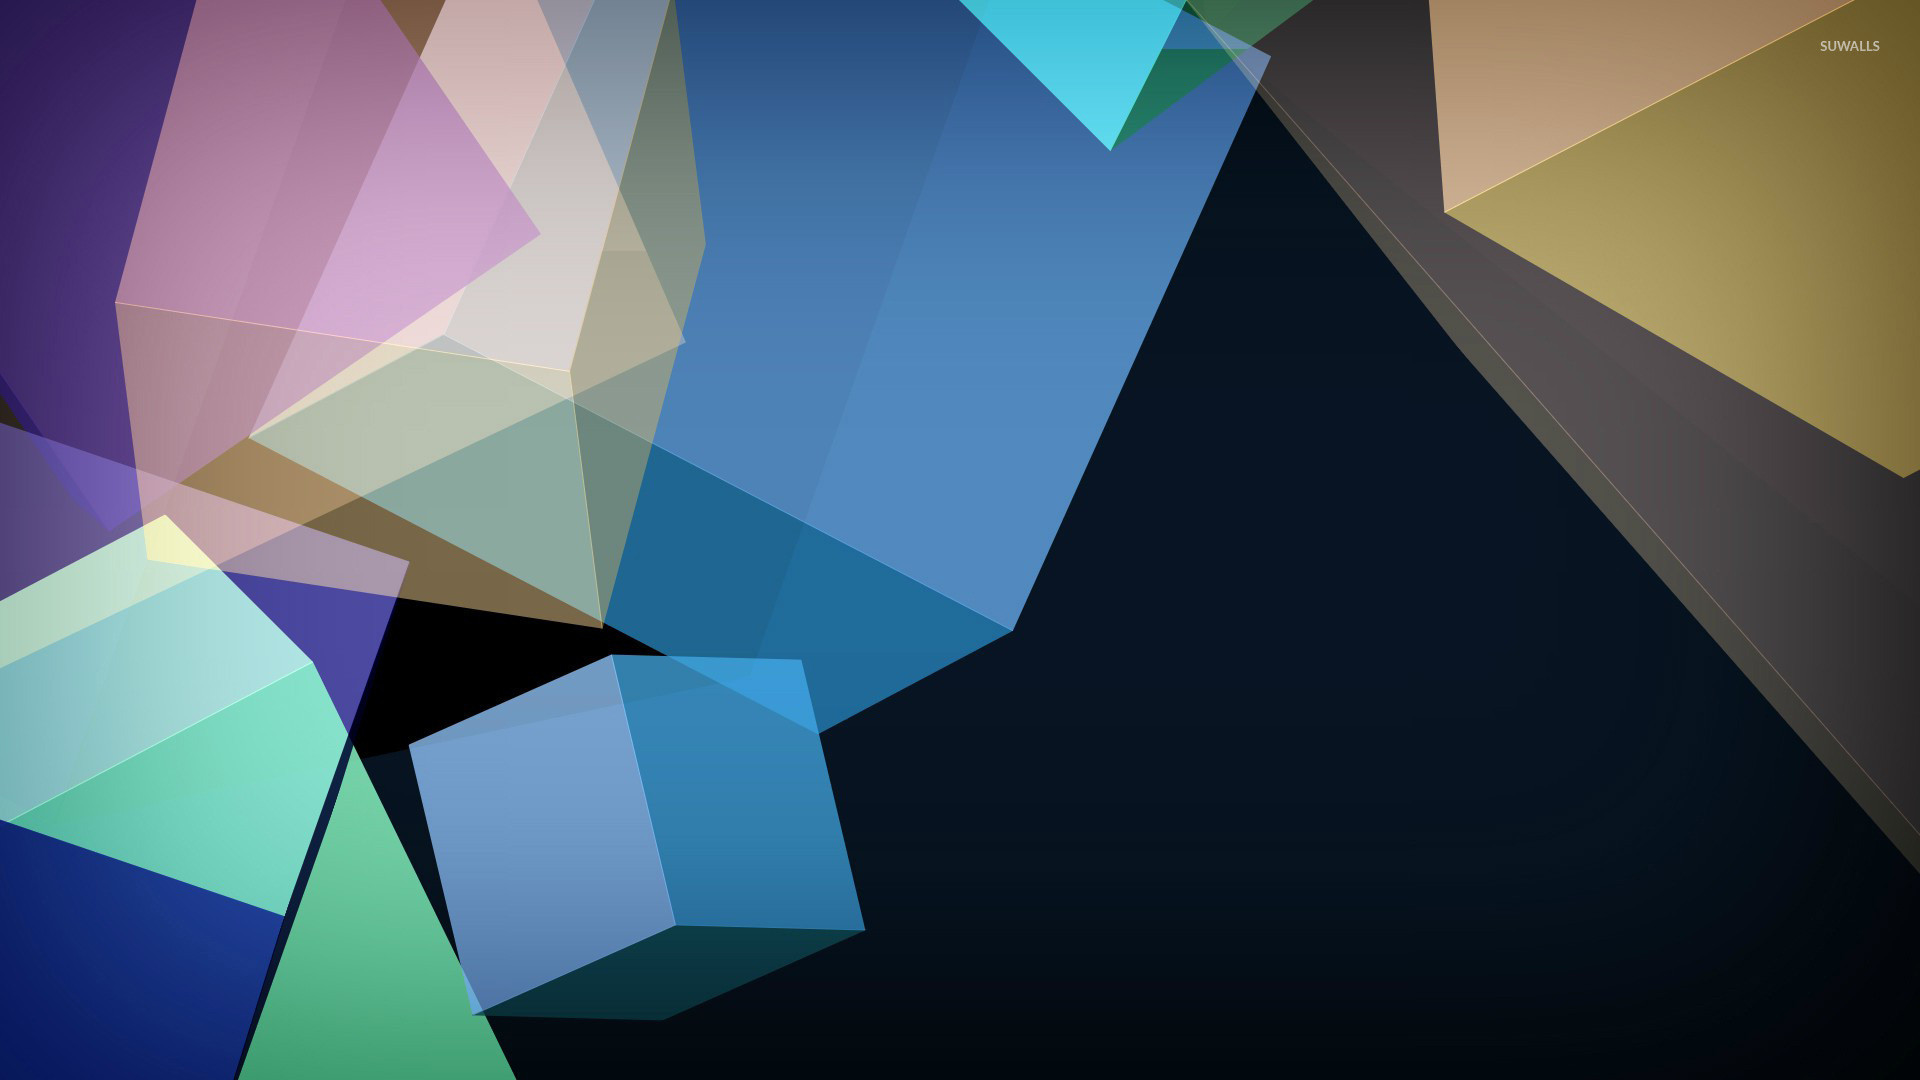 Transparent shapes wallpaper jpg